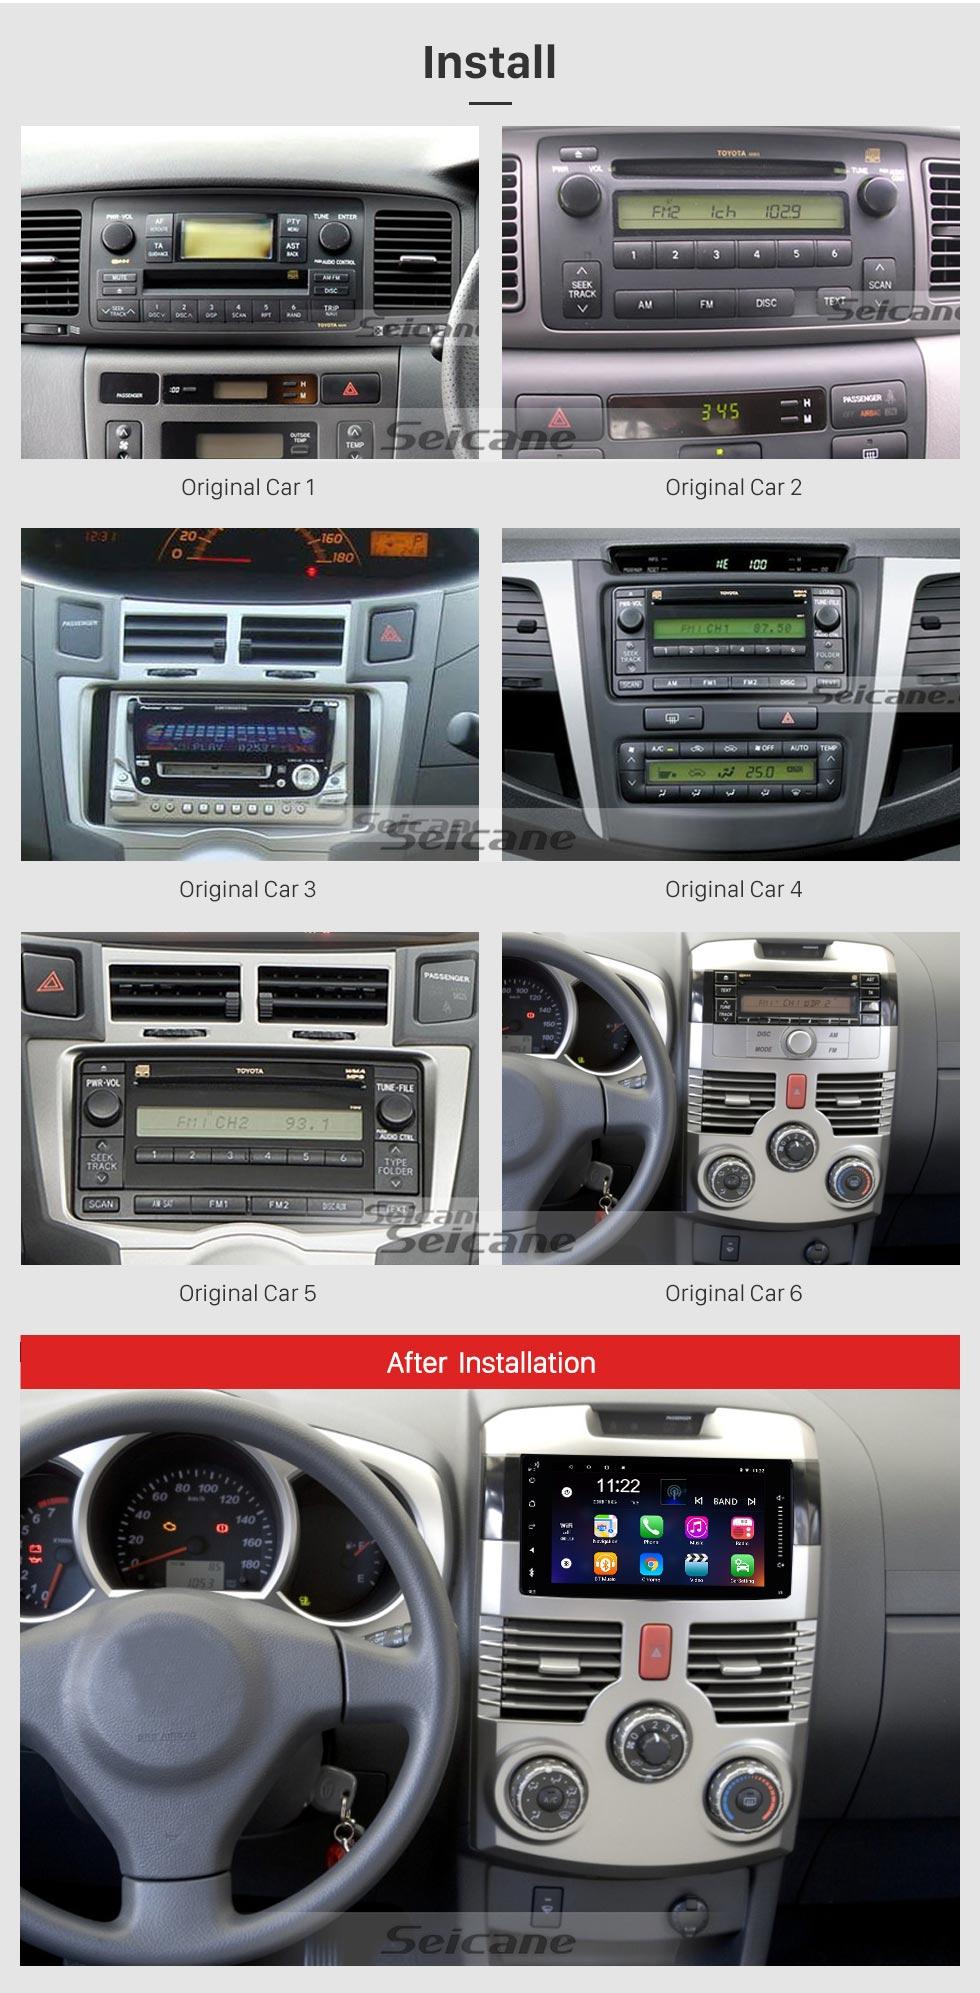 Seicane 7 inch Android 8.1  TOYOTA Corolla universal HD Touchscreen Radio GPS Navigation System Support Bluetooth USB Carplay OBD2 DAB+ DVR